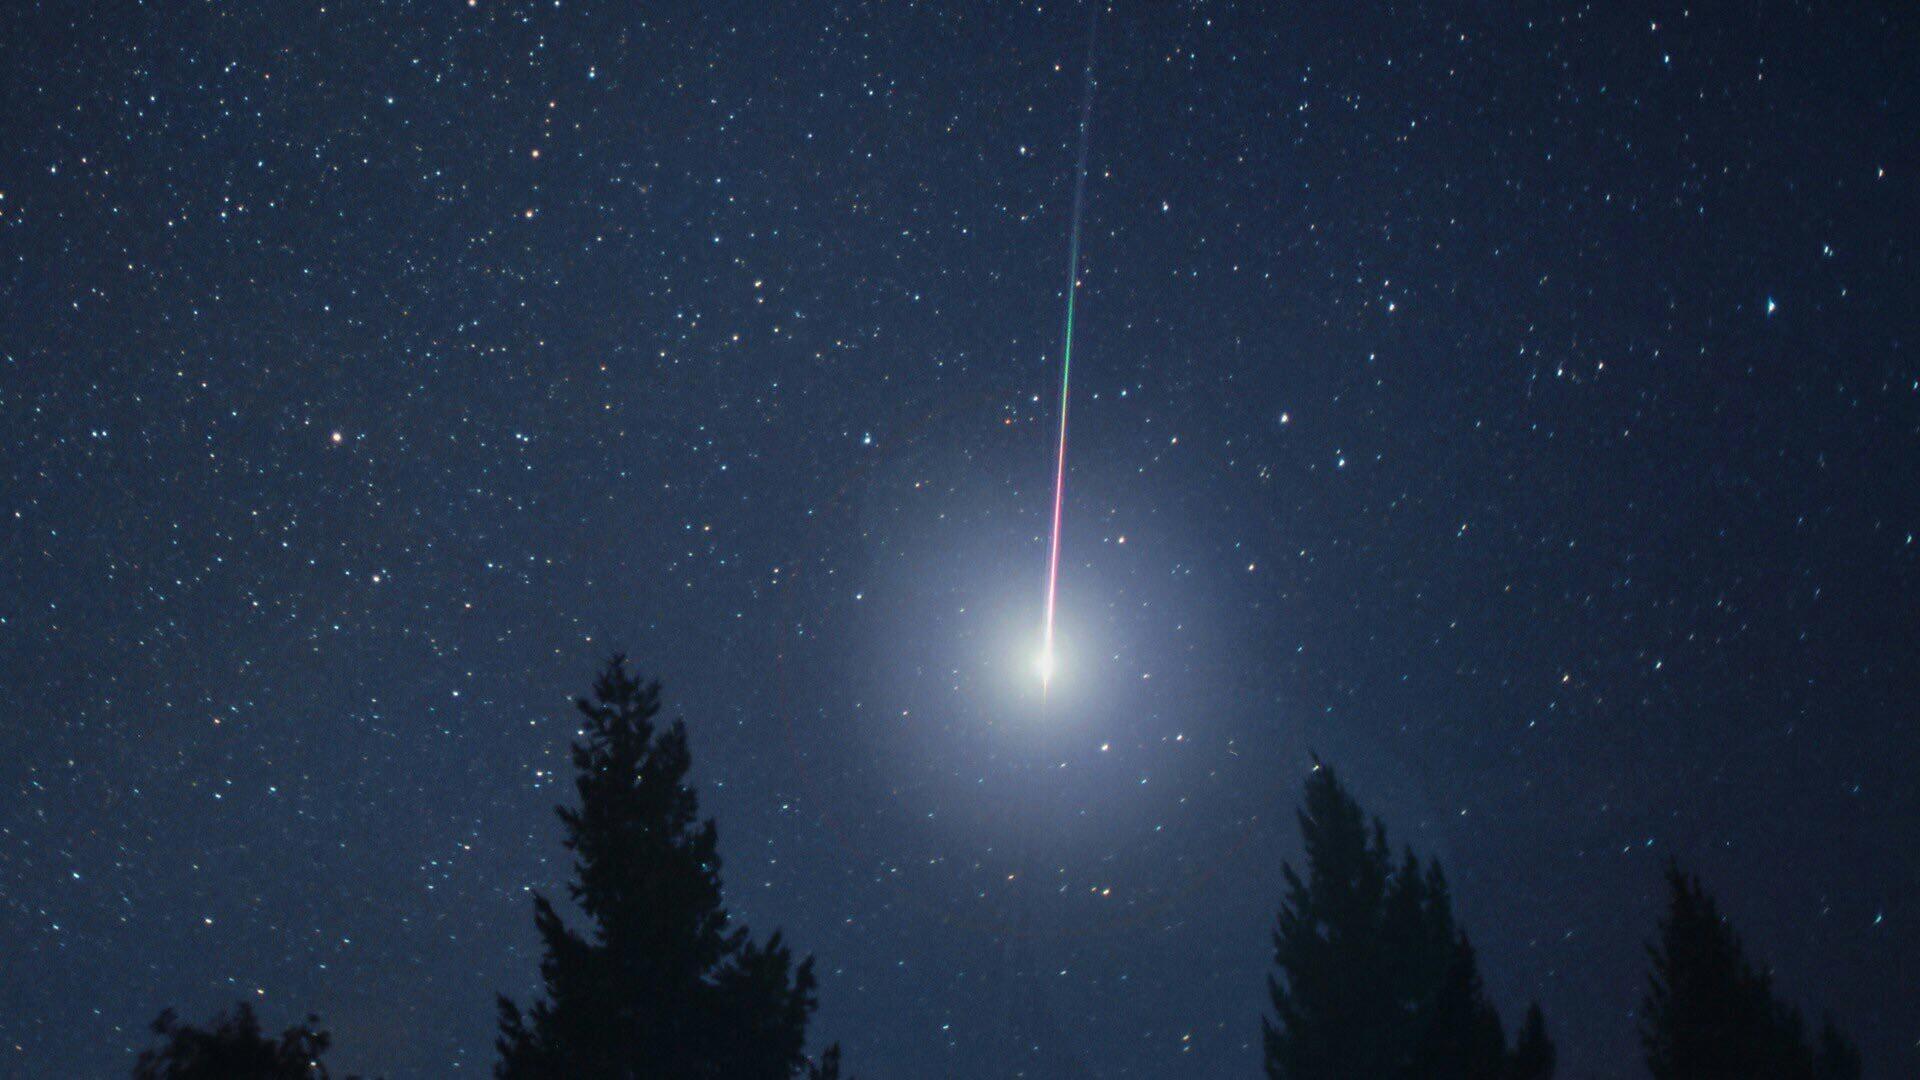 1920x1080 Shooting Star Wallpapers Stars Hd Space 1600x1200PX Wallpaper